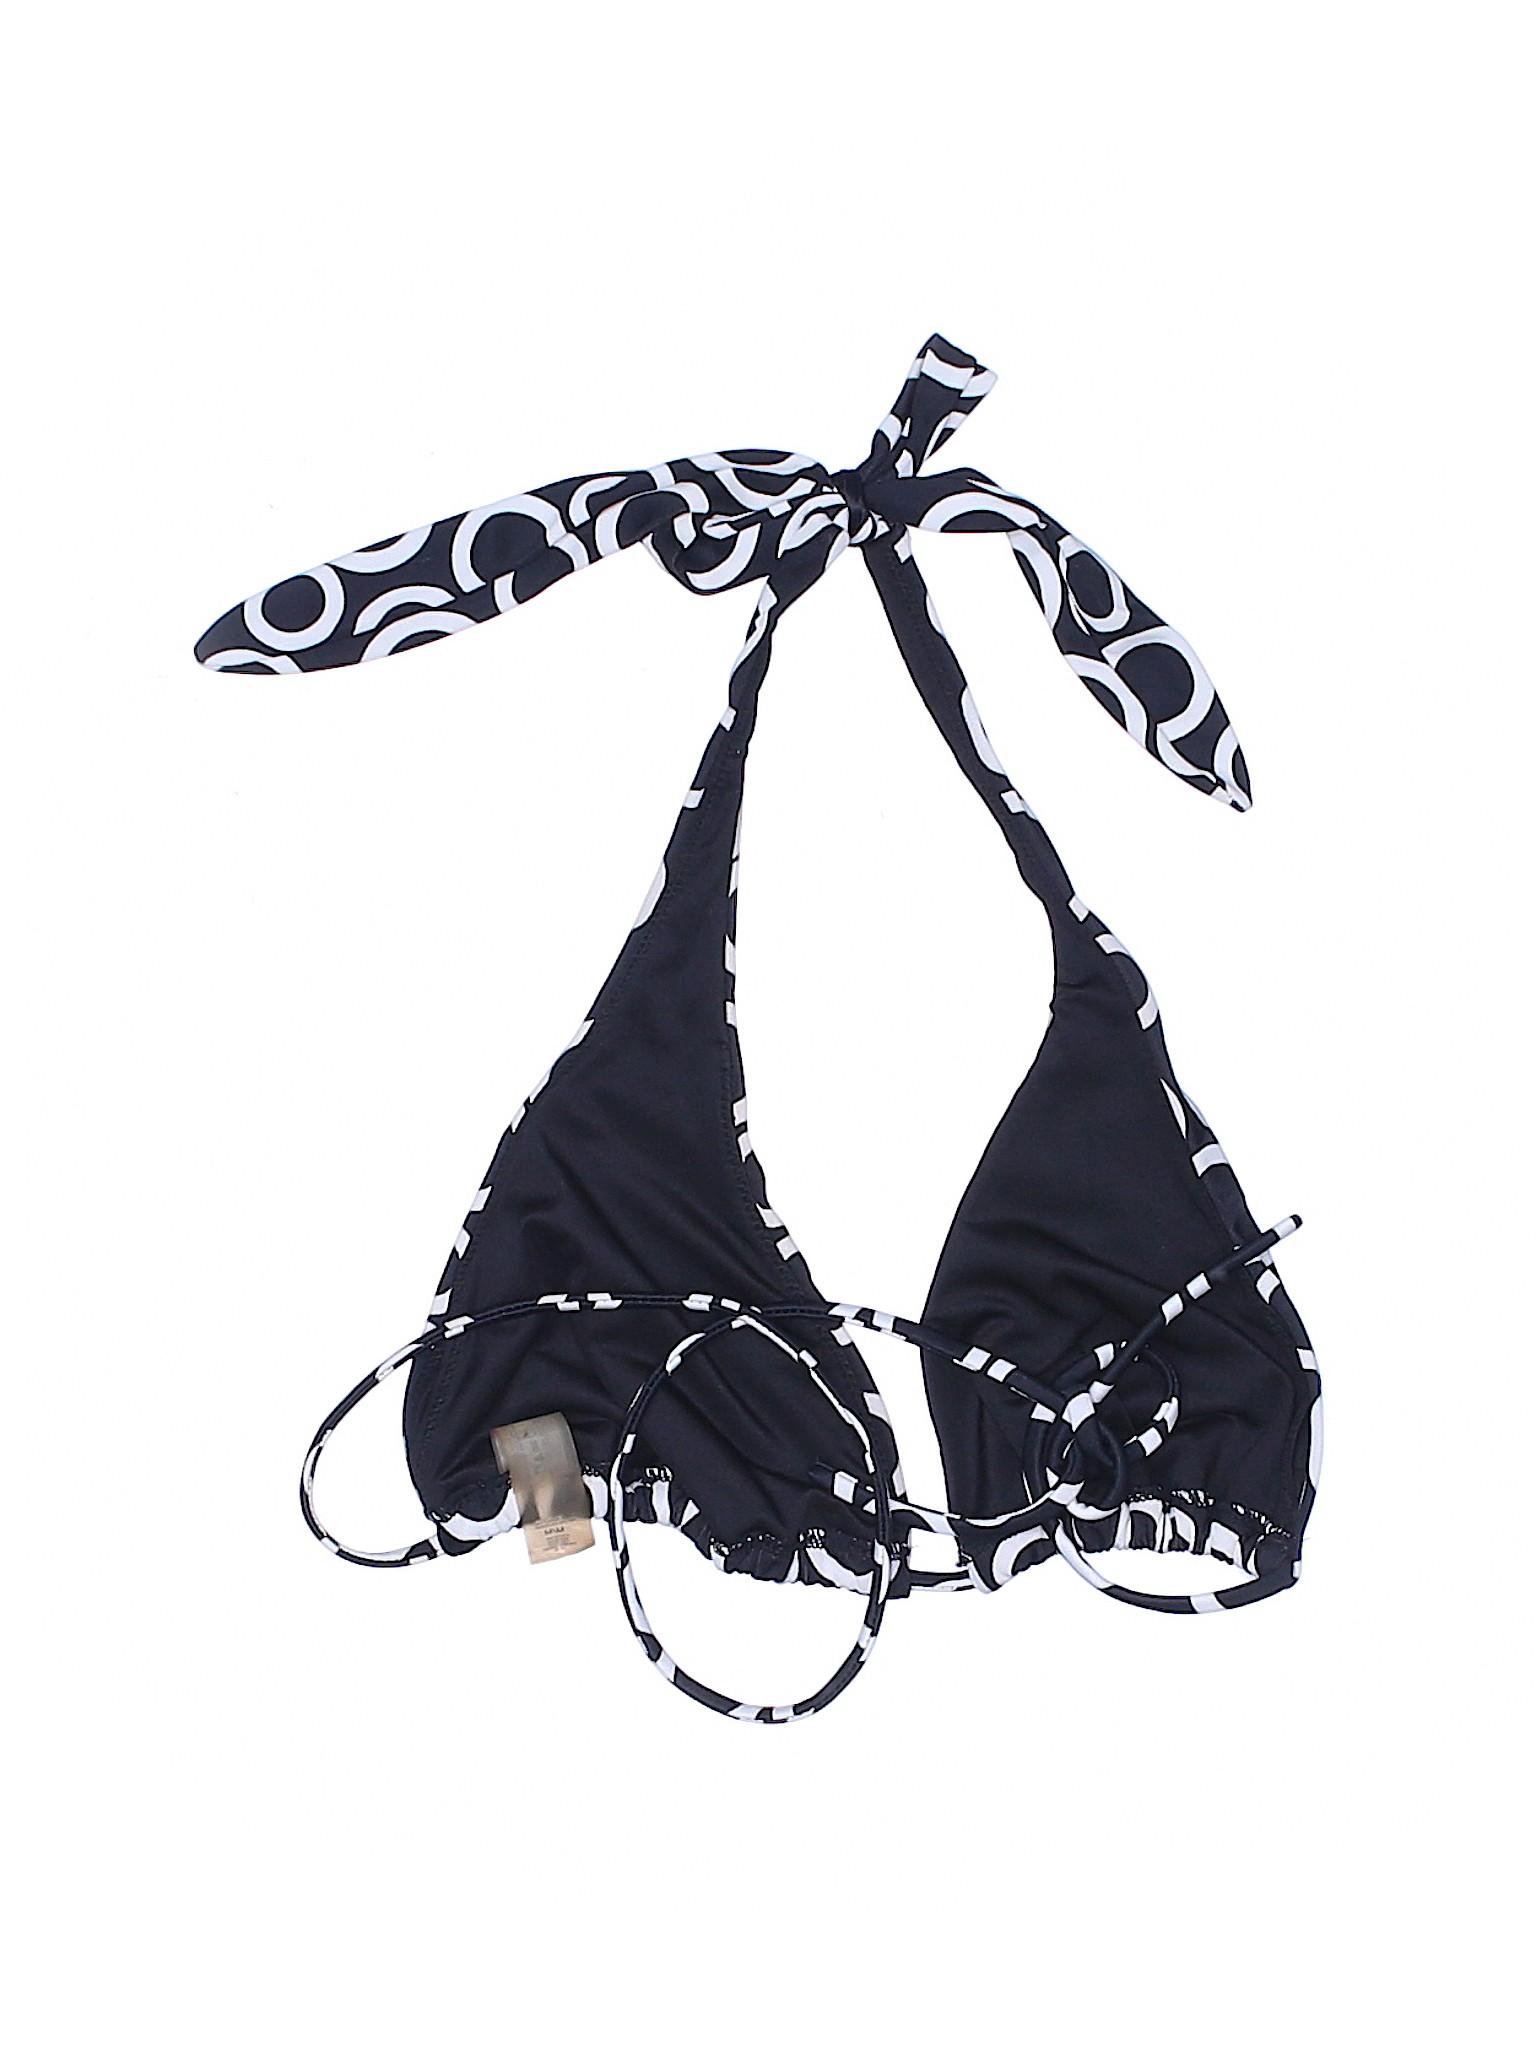 Swimsuit Victoria's Swimsuit Secret Swimsuit Victoria's Top Boutique Top Secret Top Victoria's Boutique Secret Boutique rr8qxw1p